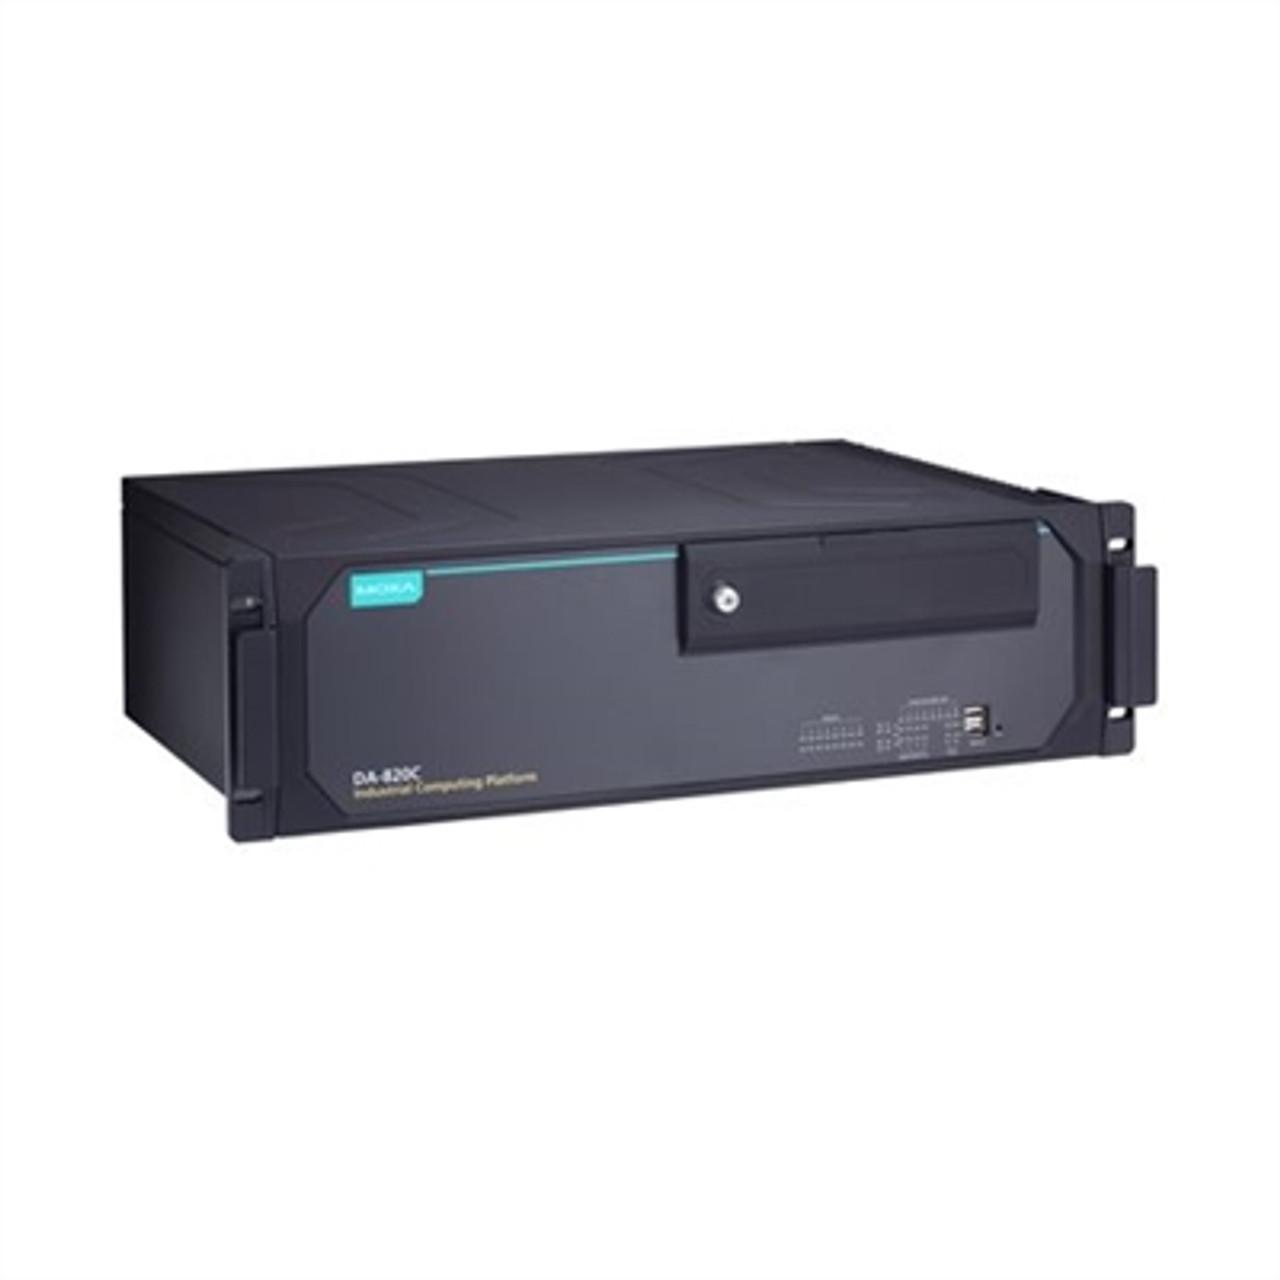 Moxa DA-820C-KLXL-HH-T x86 computer